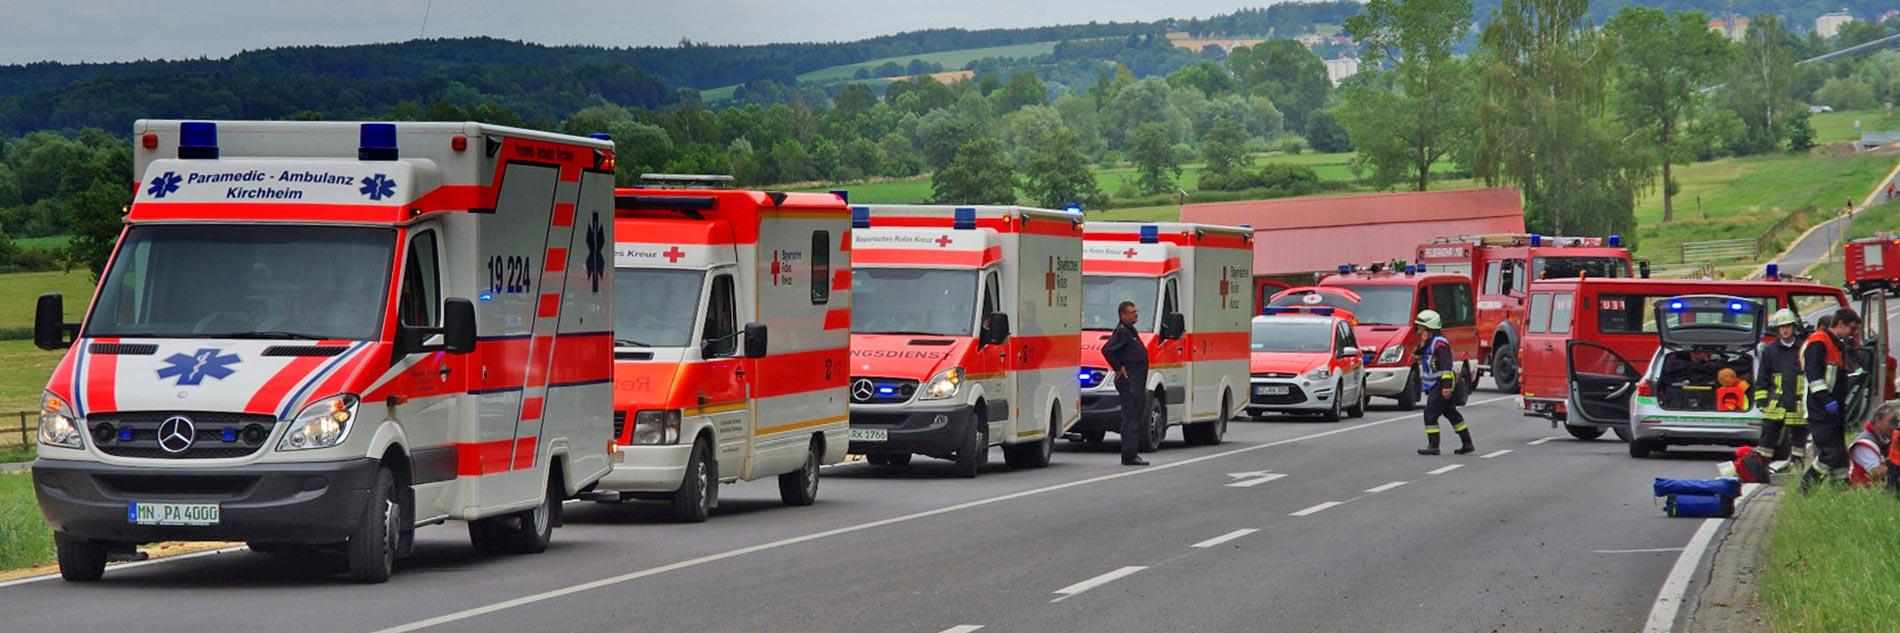 Paramedic – Katastrophenschutz